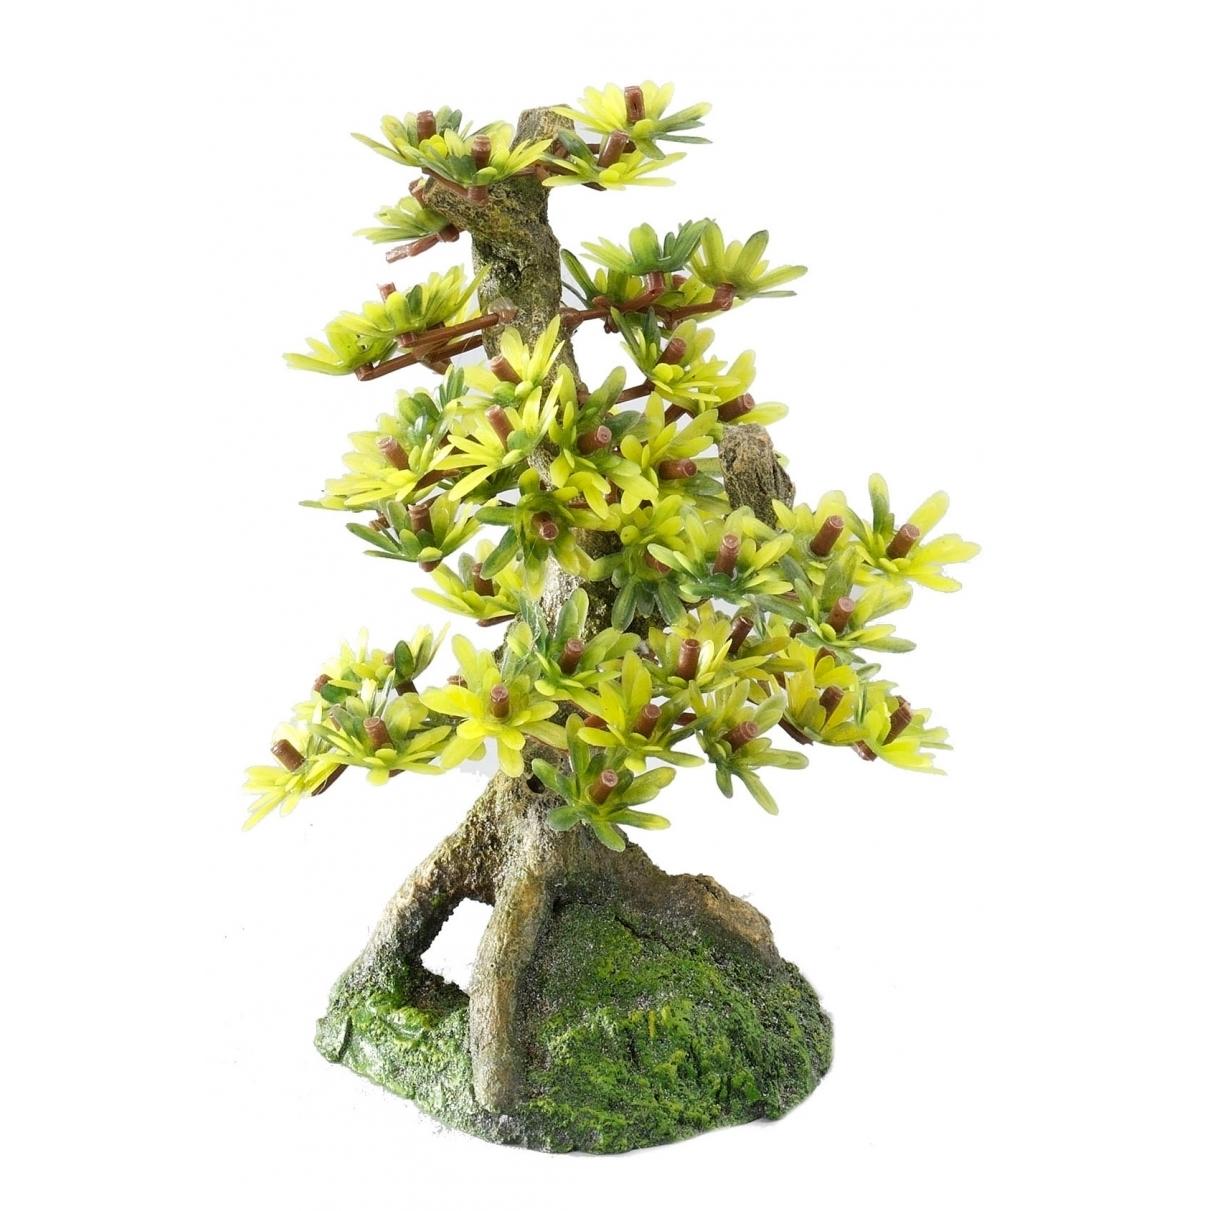 Aqua Della Bonsai Bäume, Bild 4